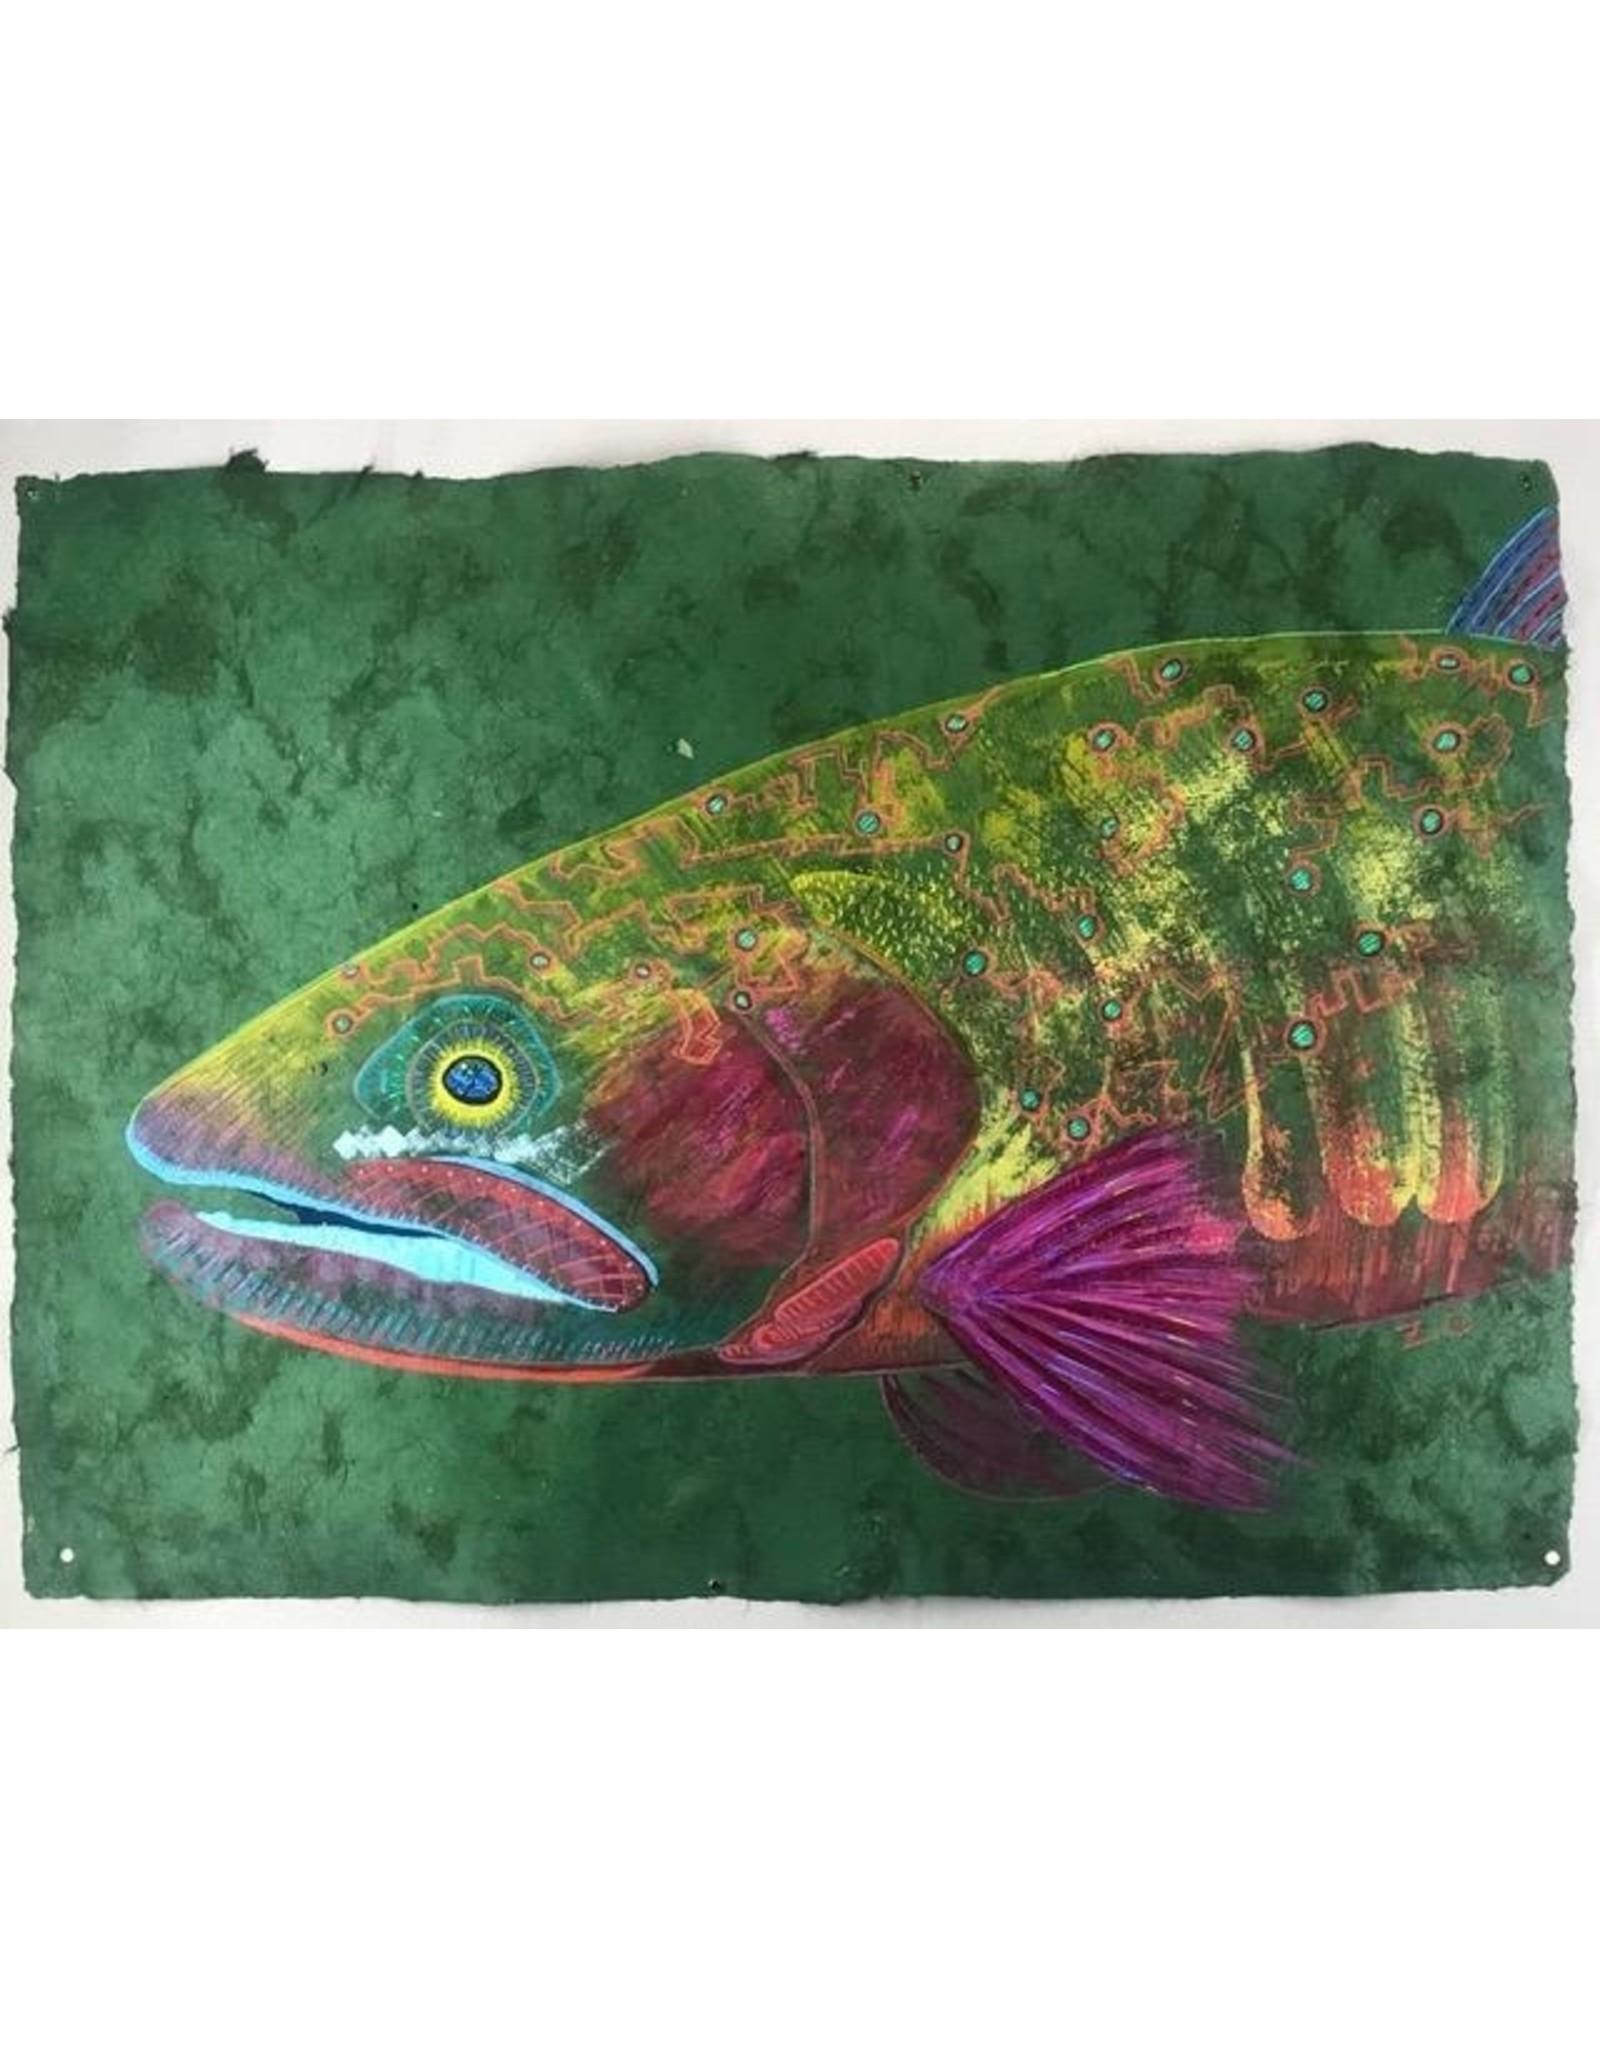 "Colorado River Cutthroat (23.5""x17.5"")  Acrylic on handmade Mayan Huun paper"